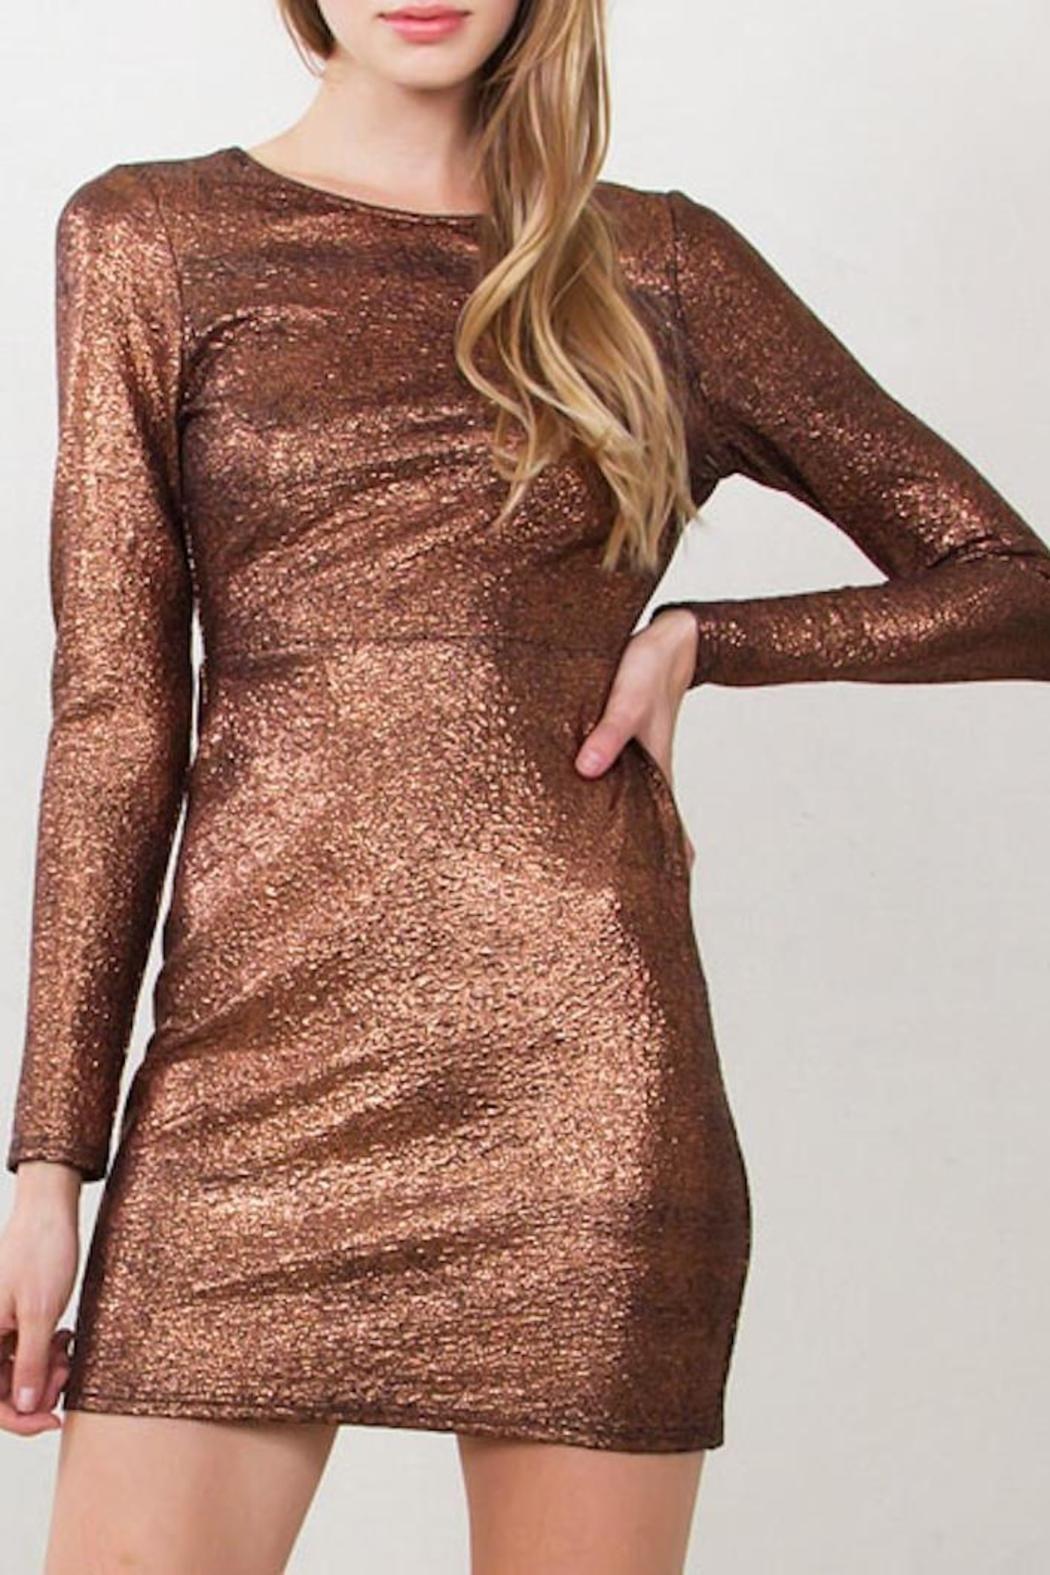 Copper metallic long sleeve body con dress with an open back self